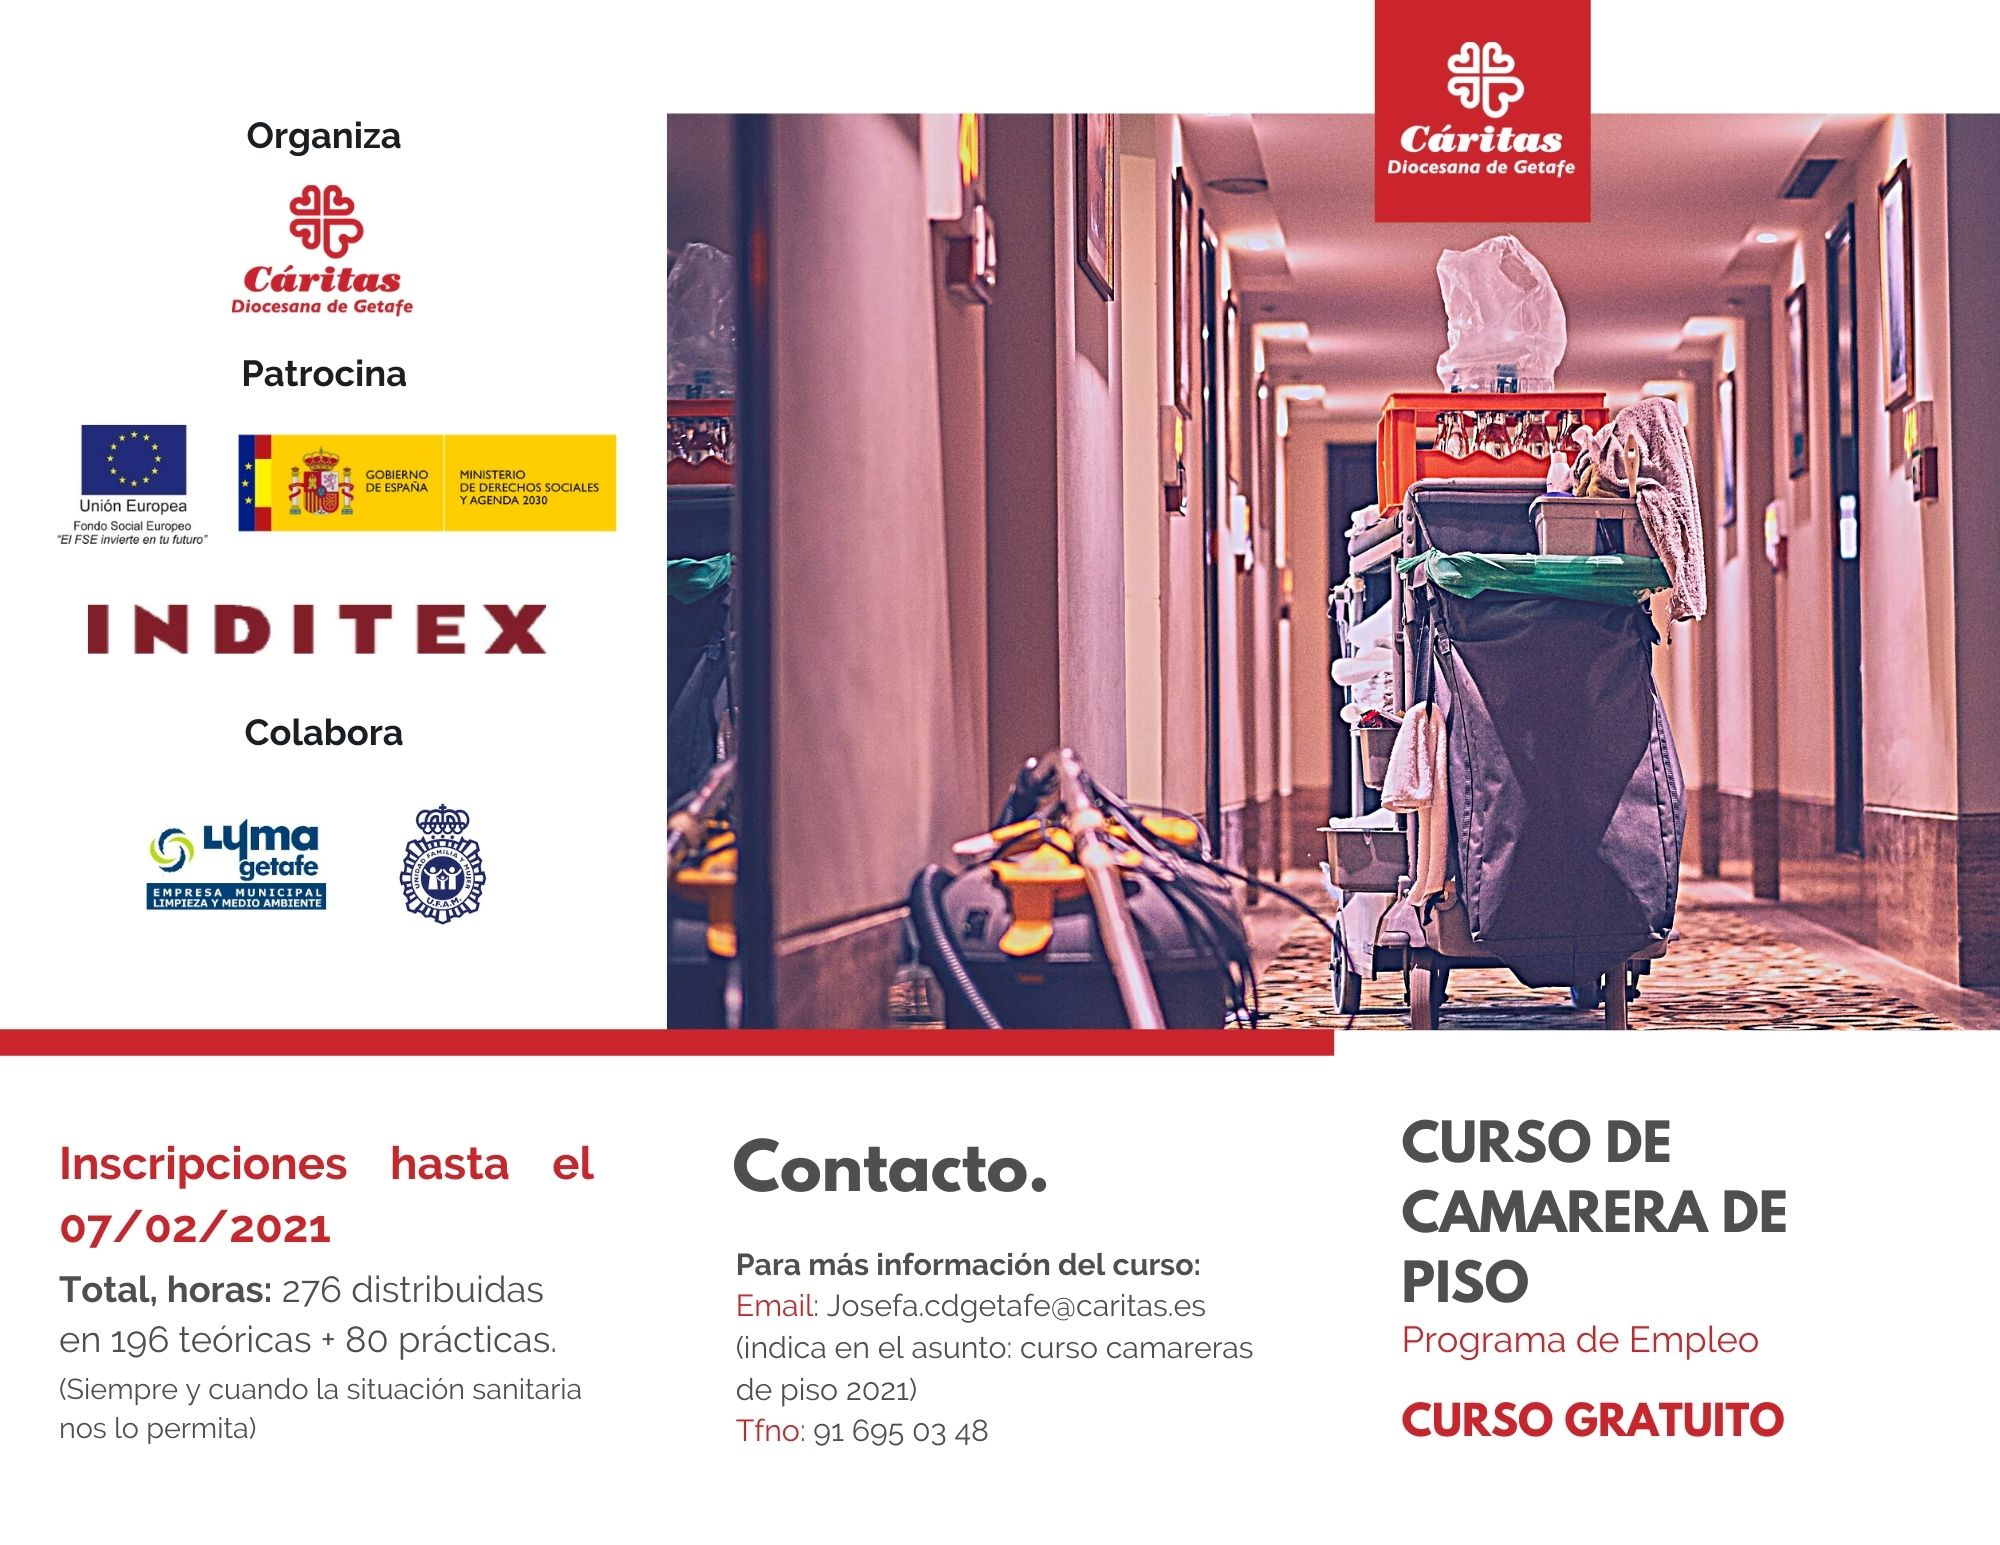 Folleto_Curso_Camarera_de_Piso_Caritas_Getafe_ok